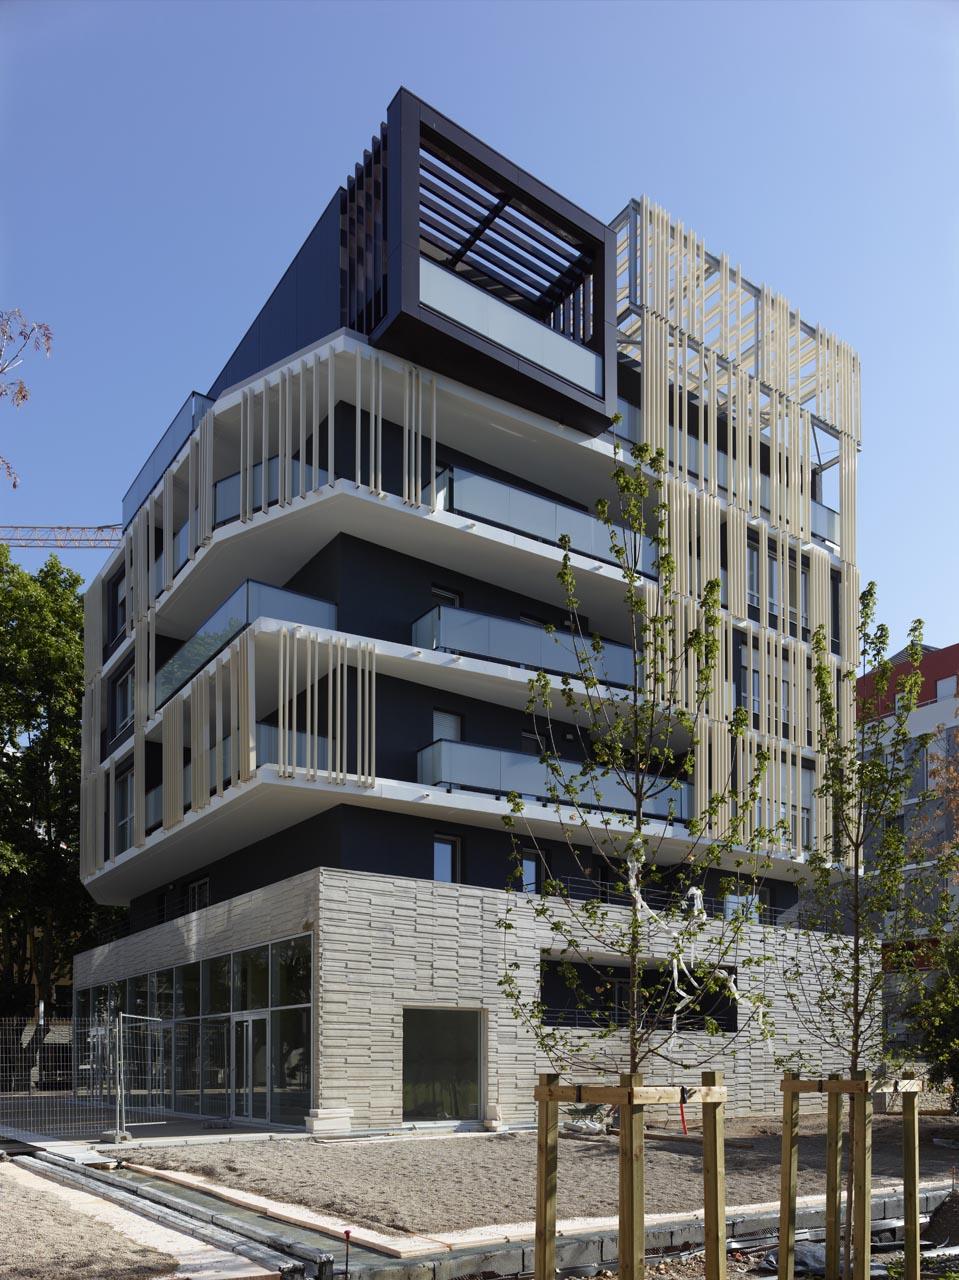 Gallery of corim logements mdr architectes 8 for Architecte montpellier